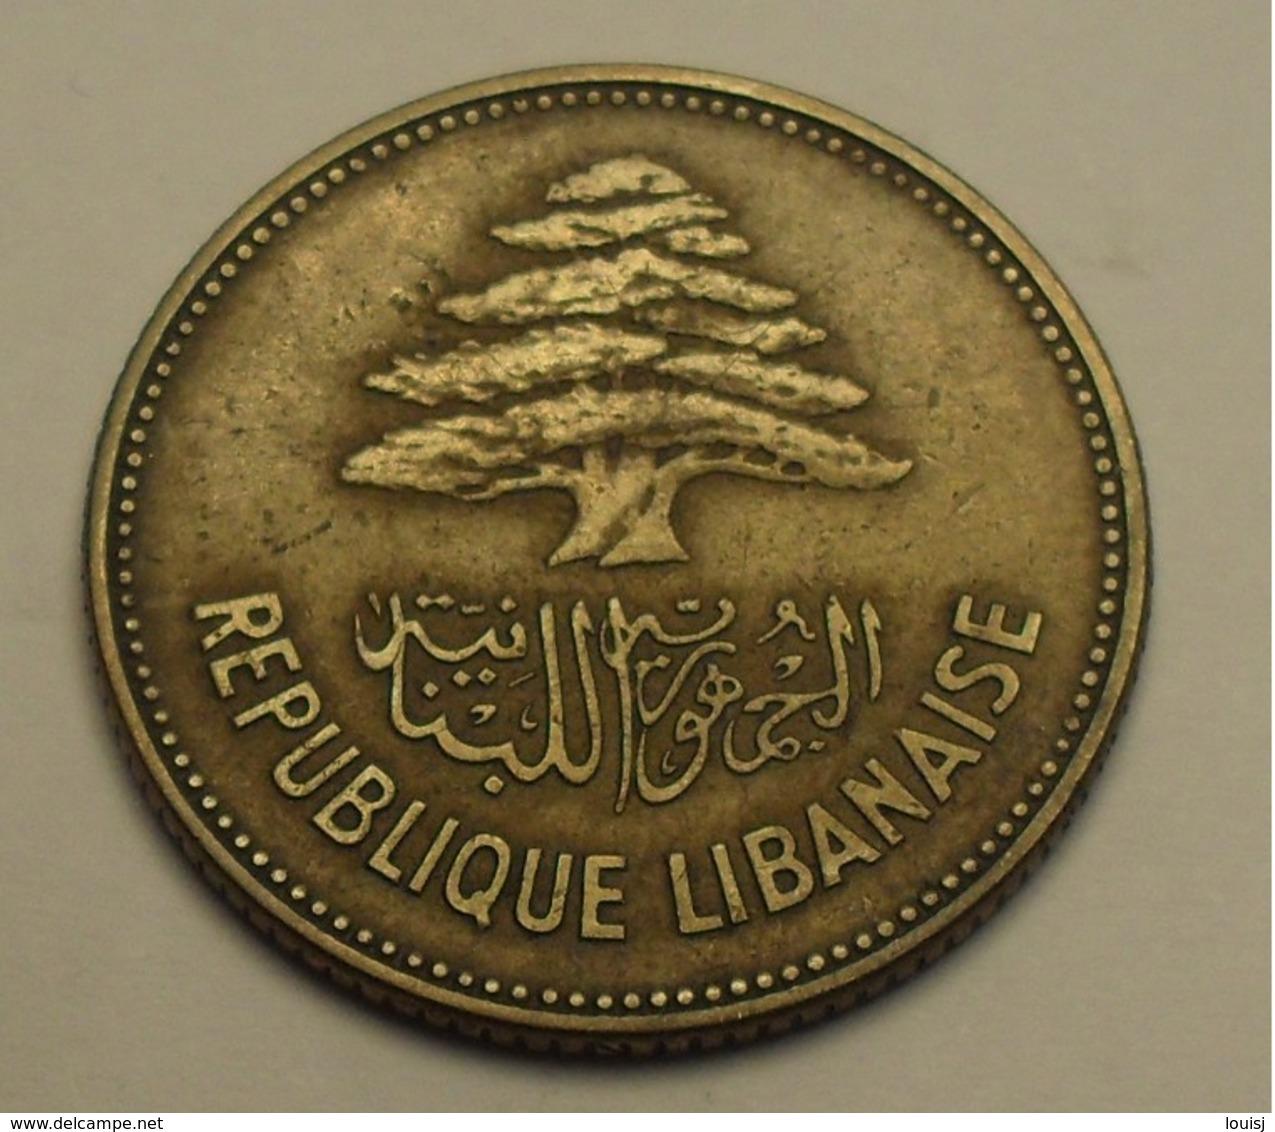 1952 - Liban - Lebanon - 25 PIASTRES - KM 16.1 - Liban